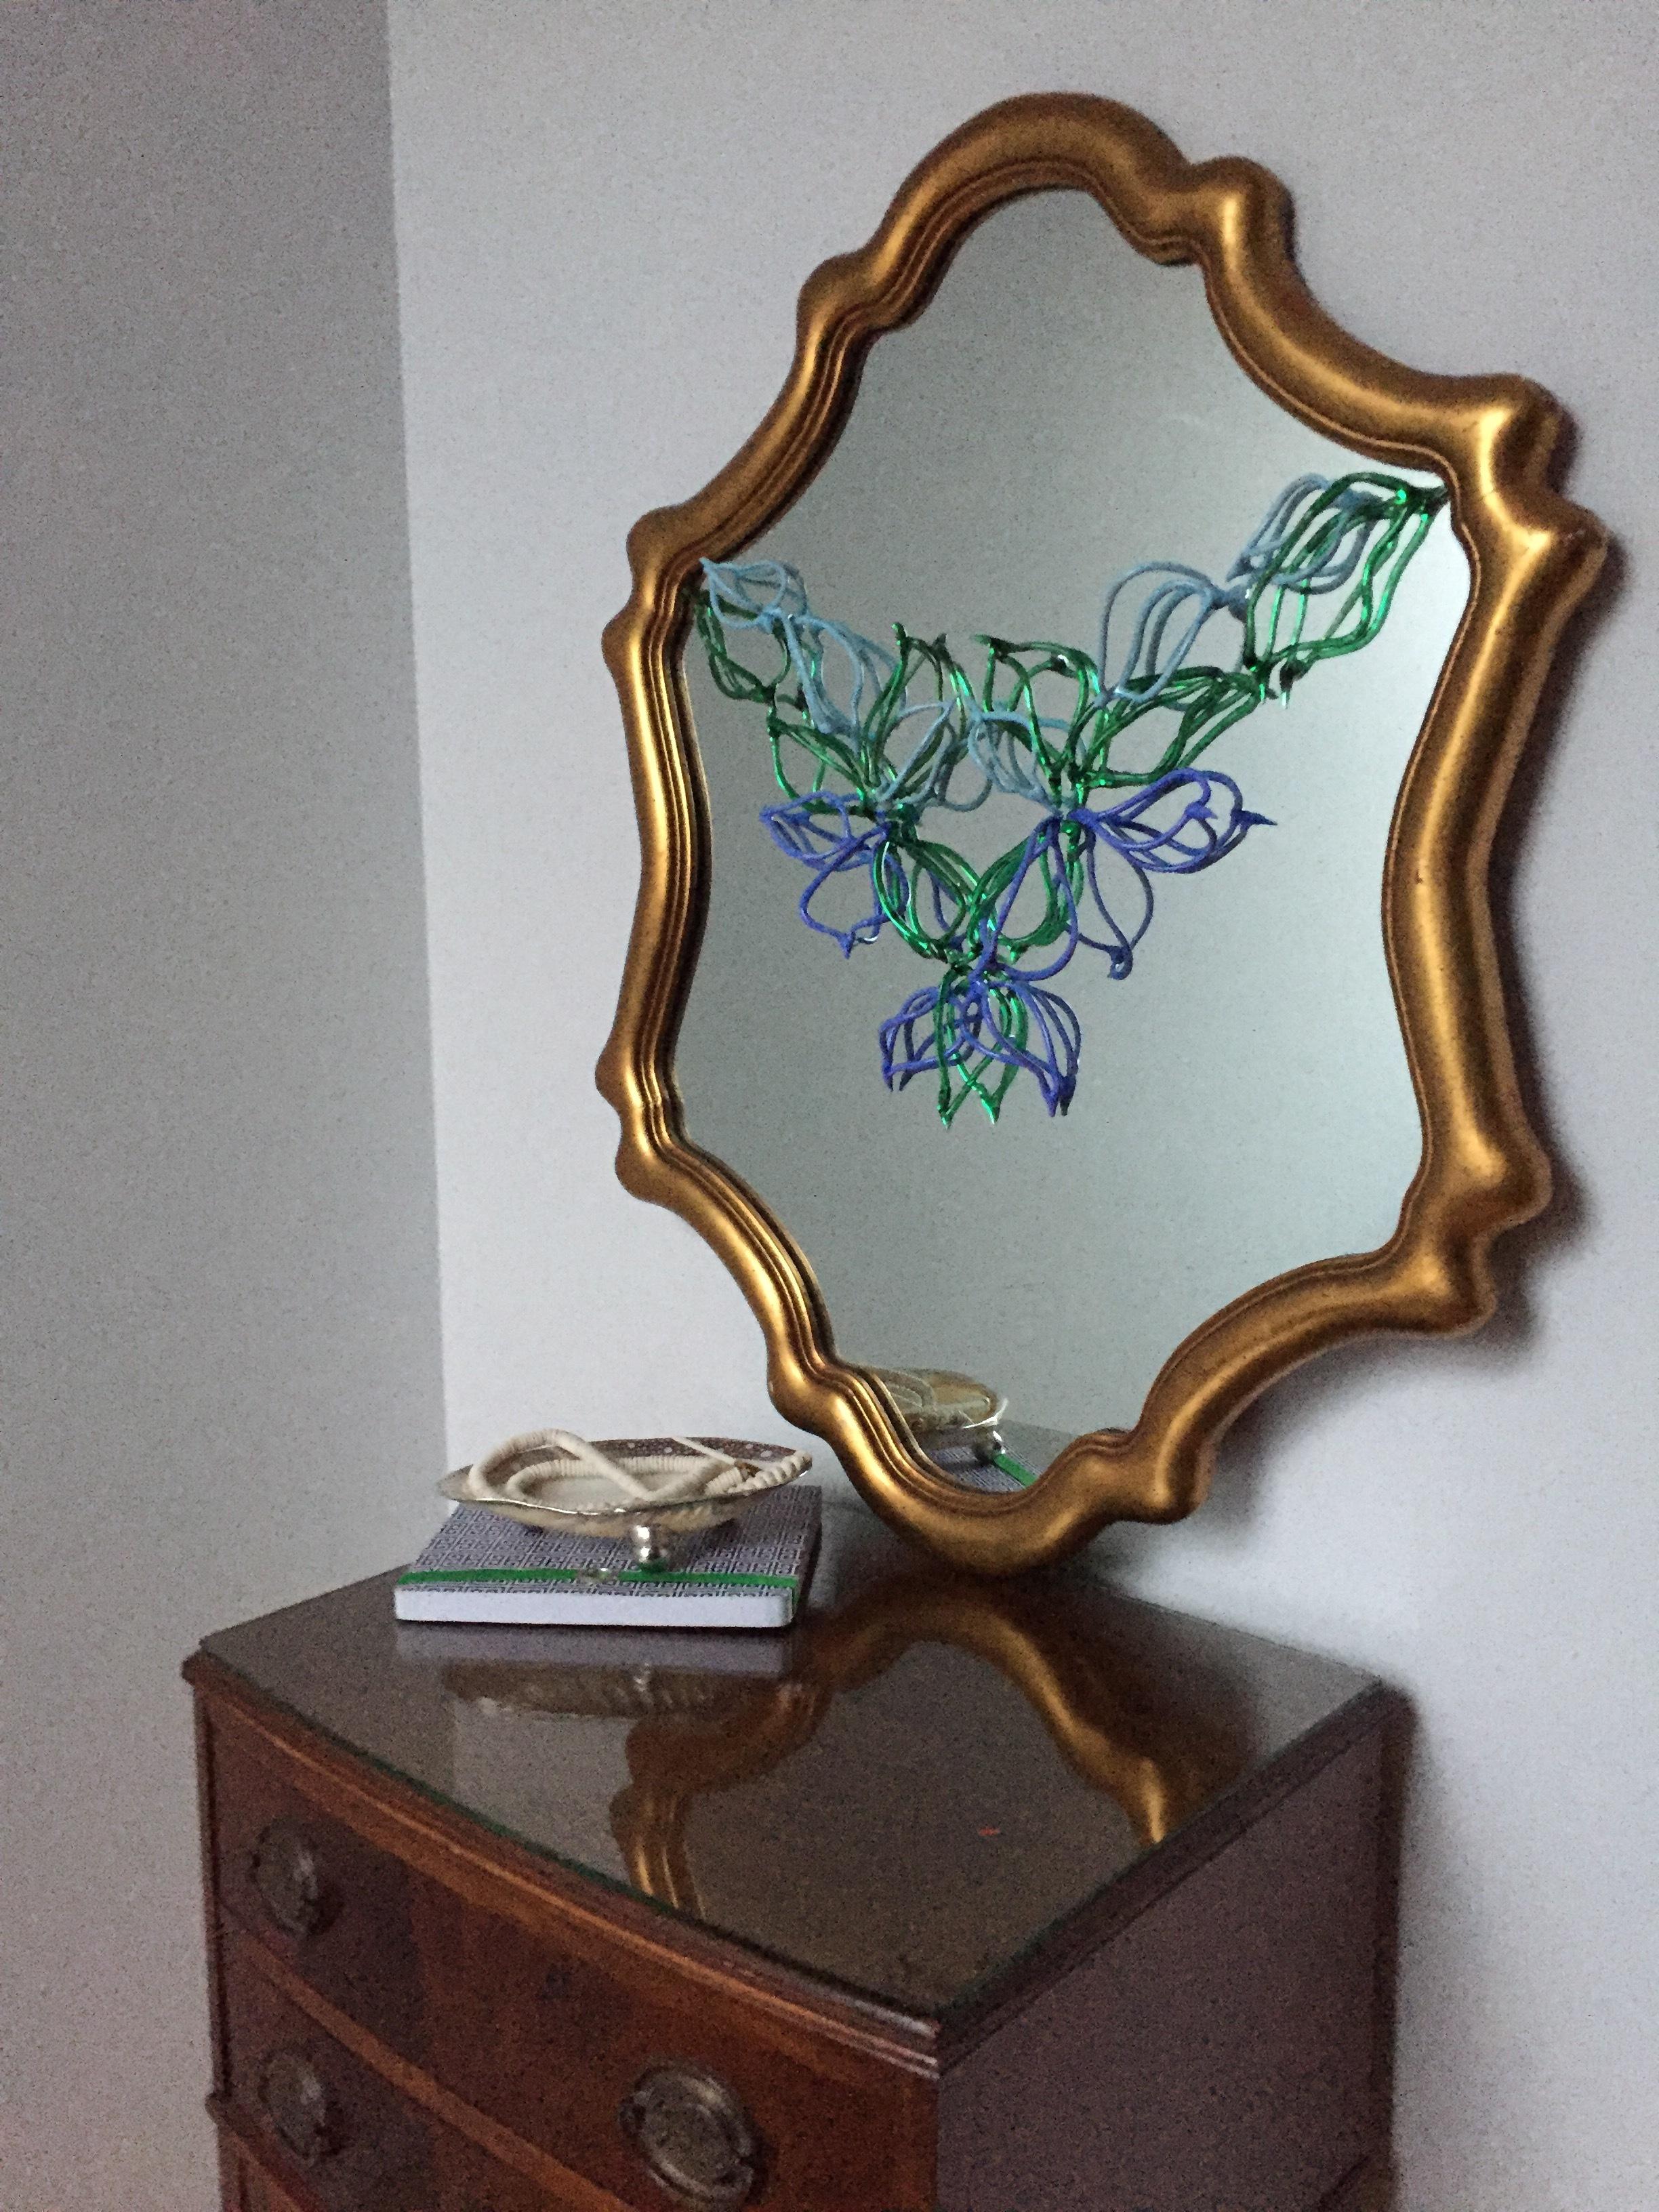 "JELLY PALACE MEDIUM MIRROR - <a href=""/shop-mirrors/jelly-palace-mirror-medium"">AVAILABLE</a>"